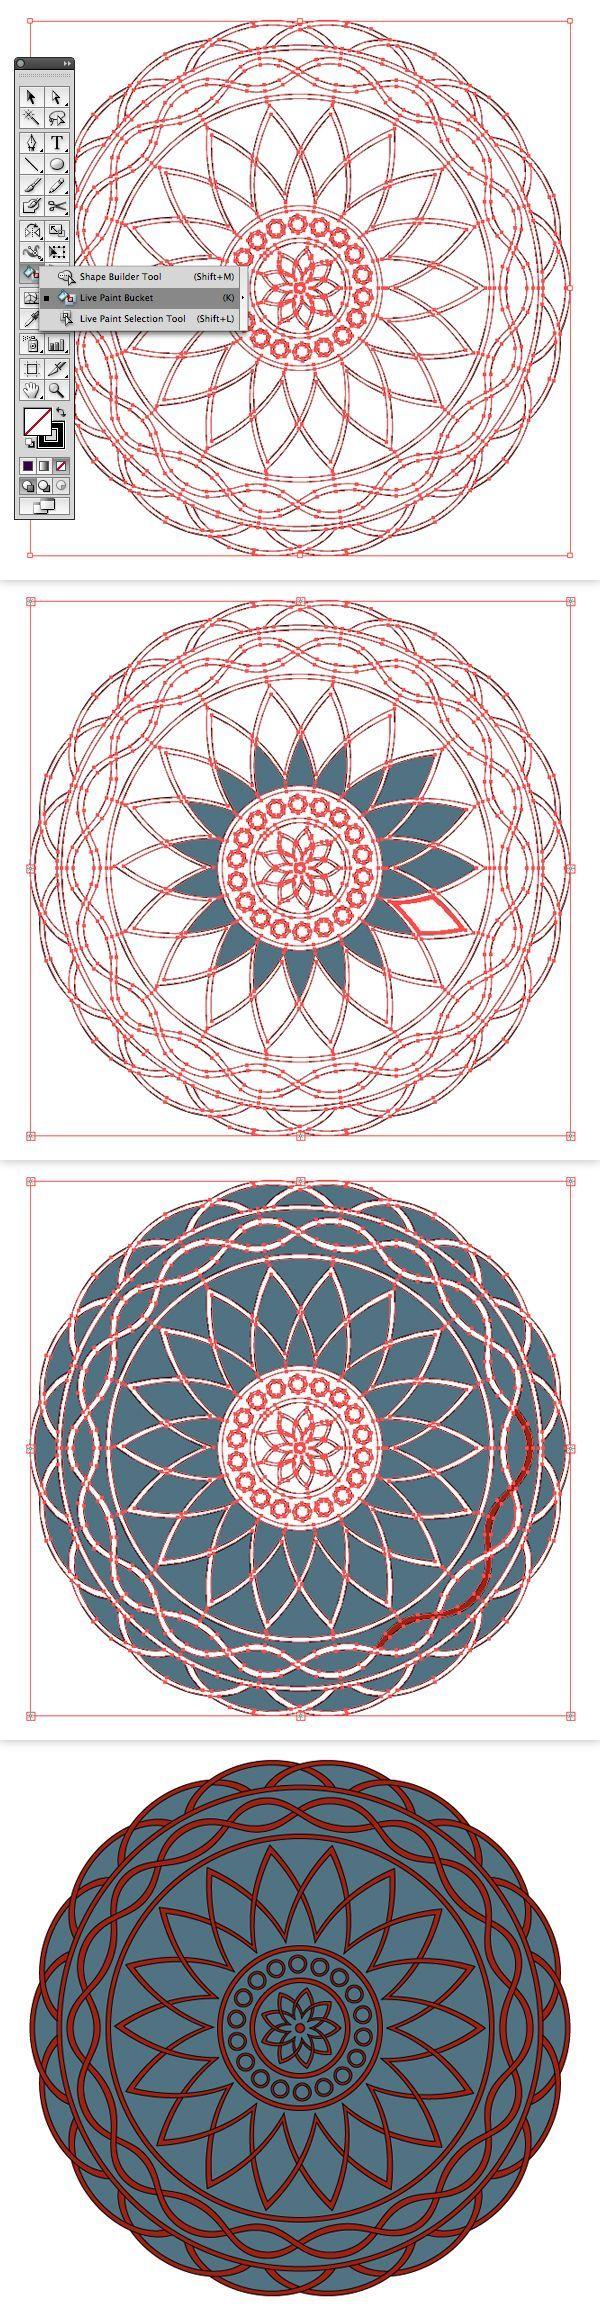 how to create a mandala design